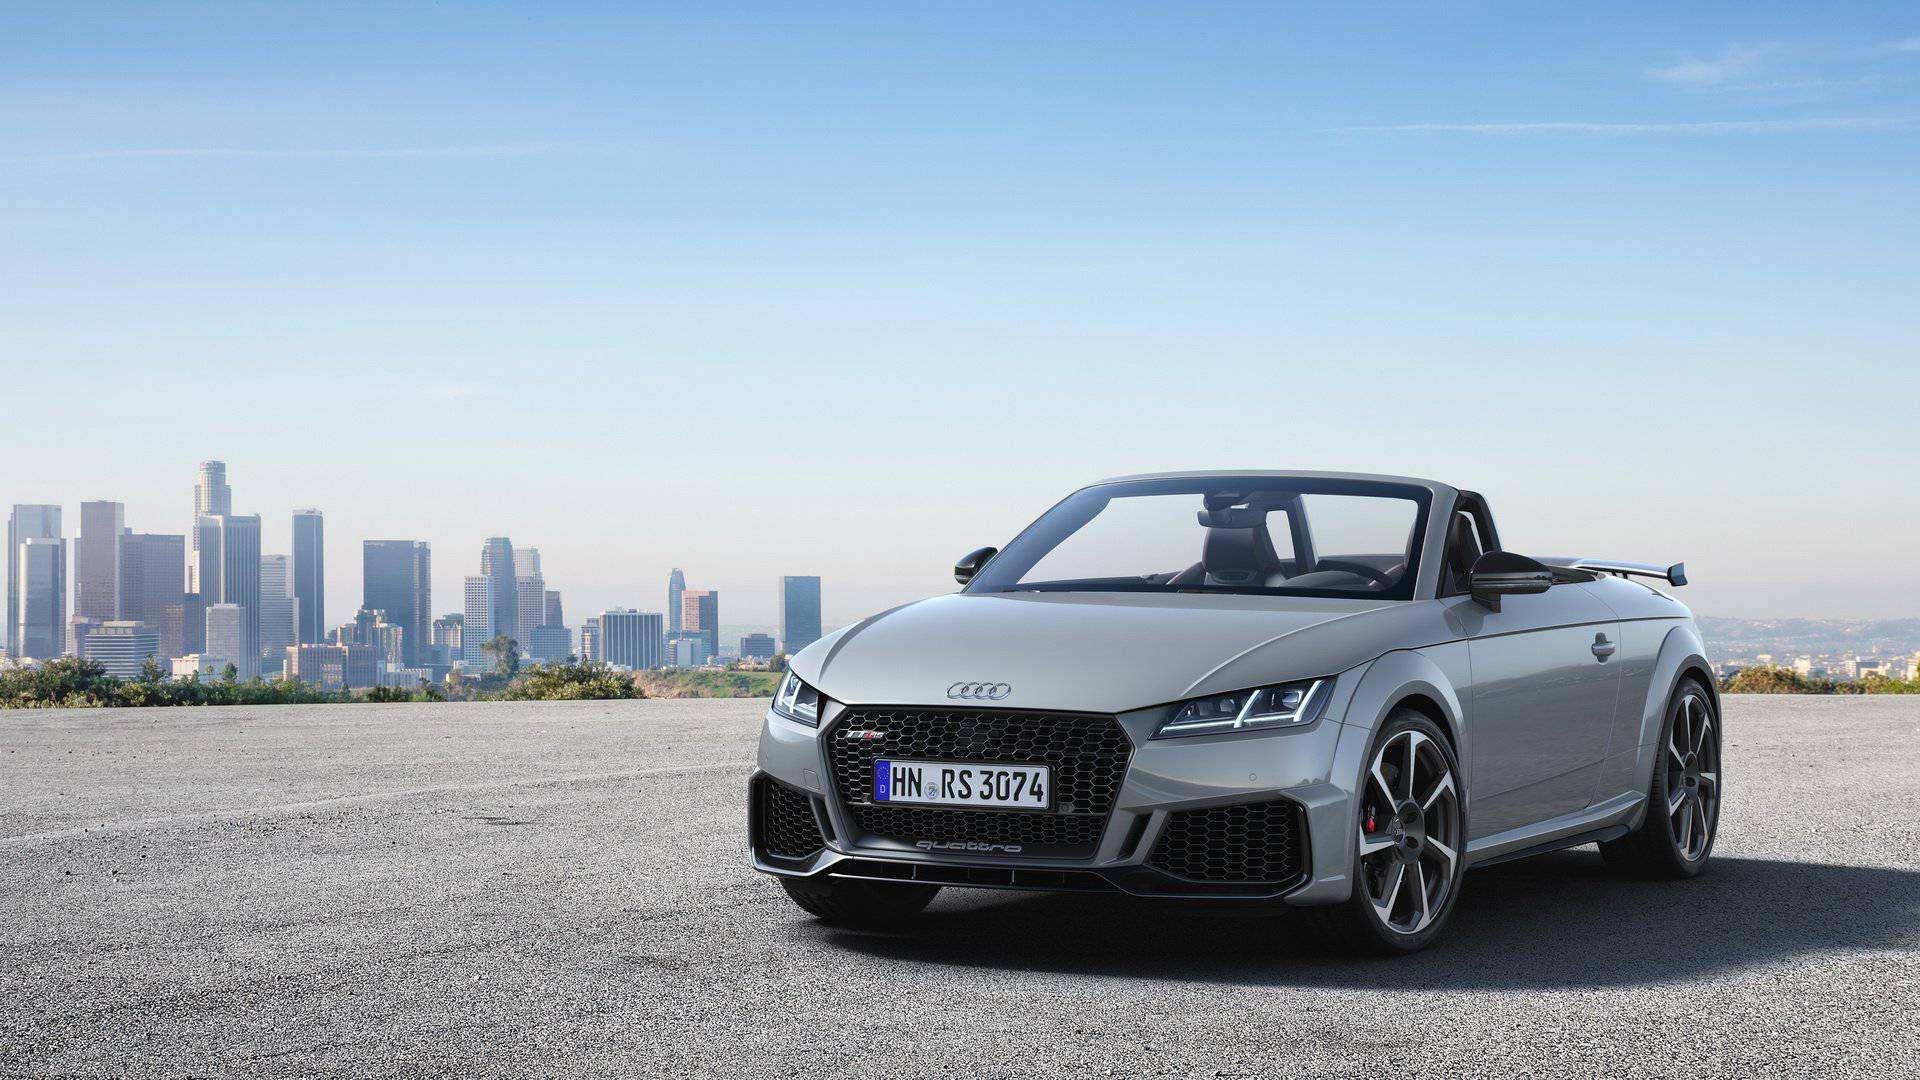 30 New Audi Tt Convertible 2020 Performance with Audi Tt Convertible 2020